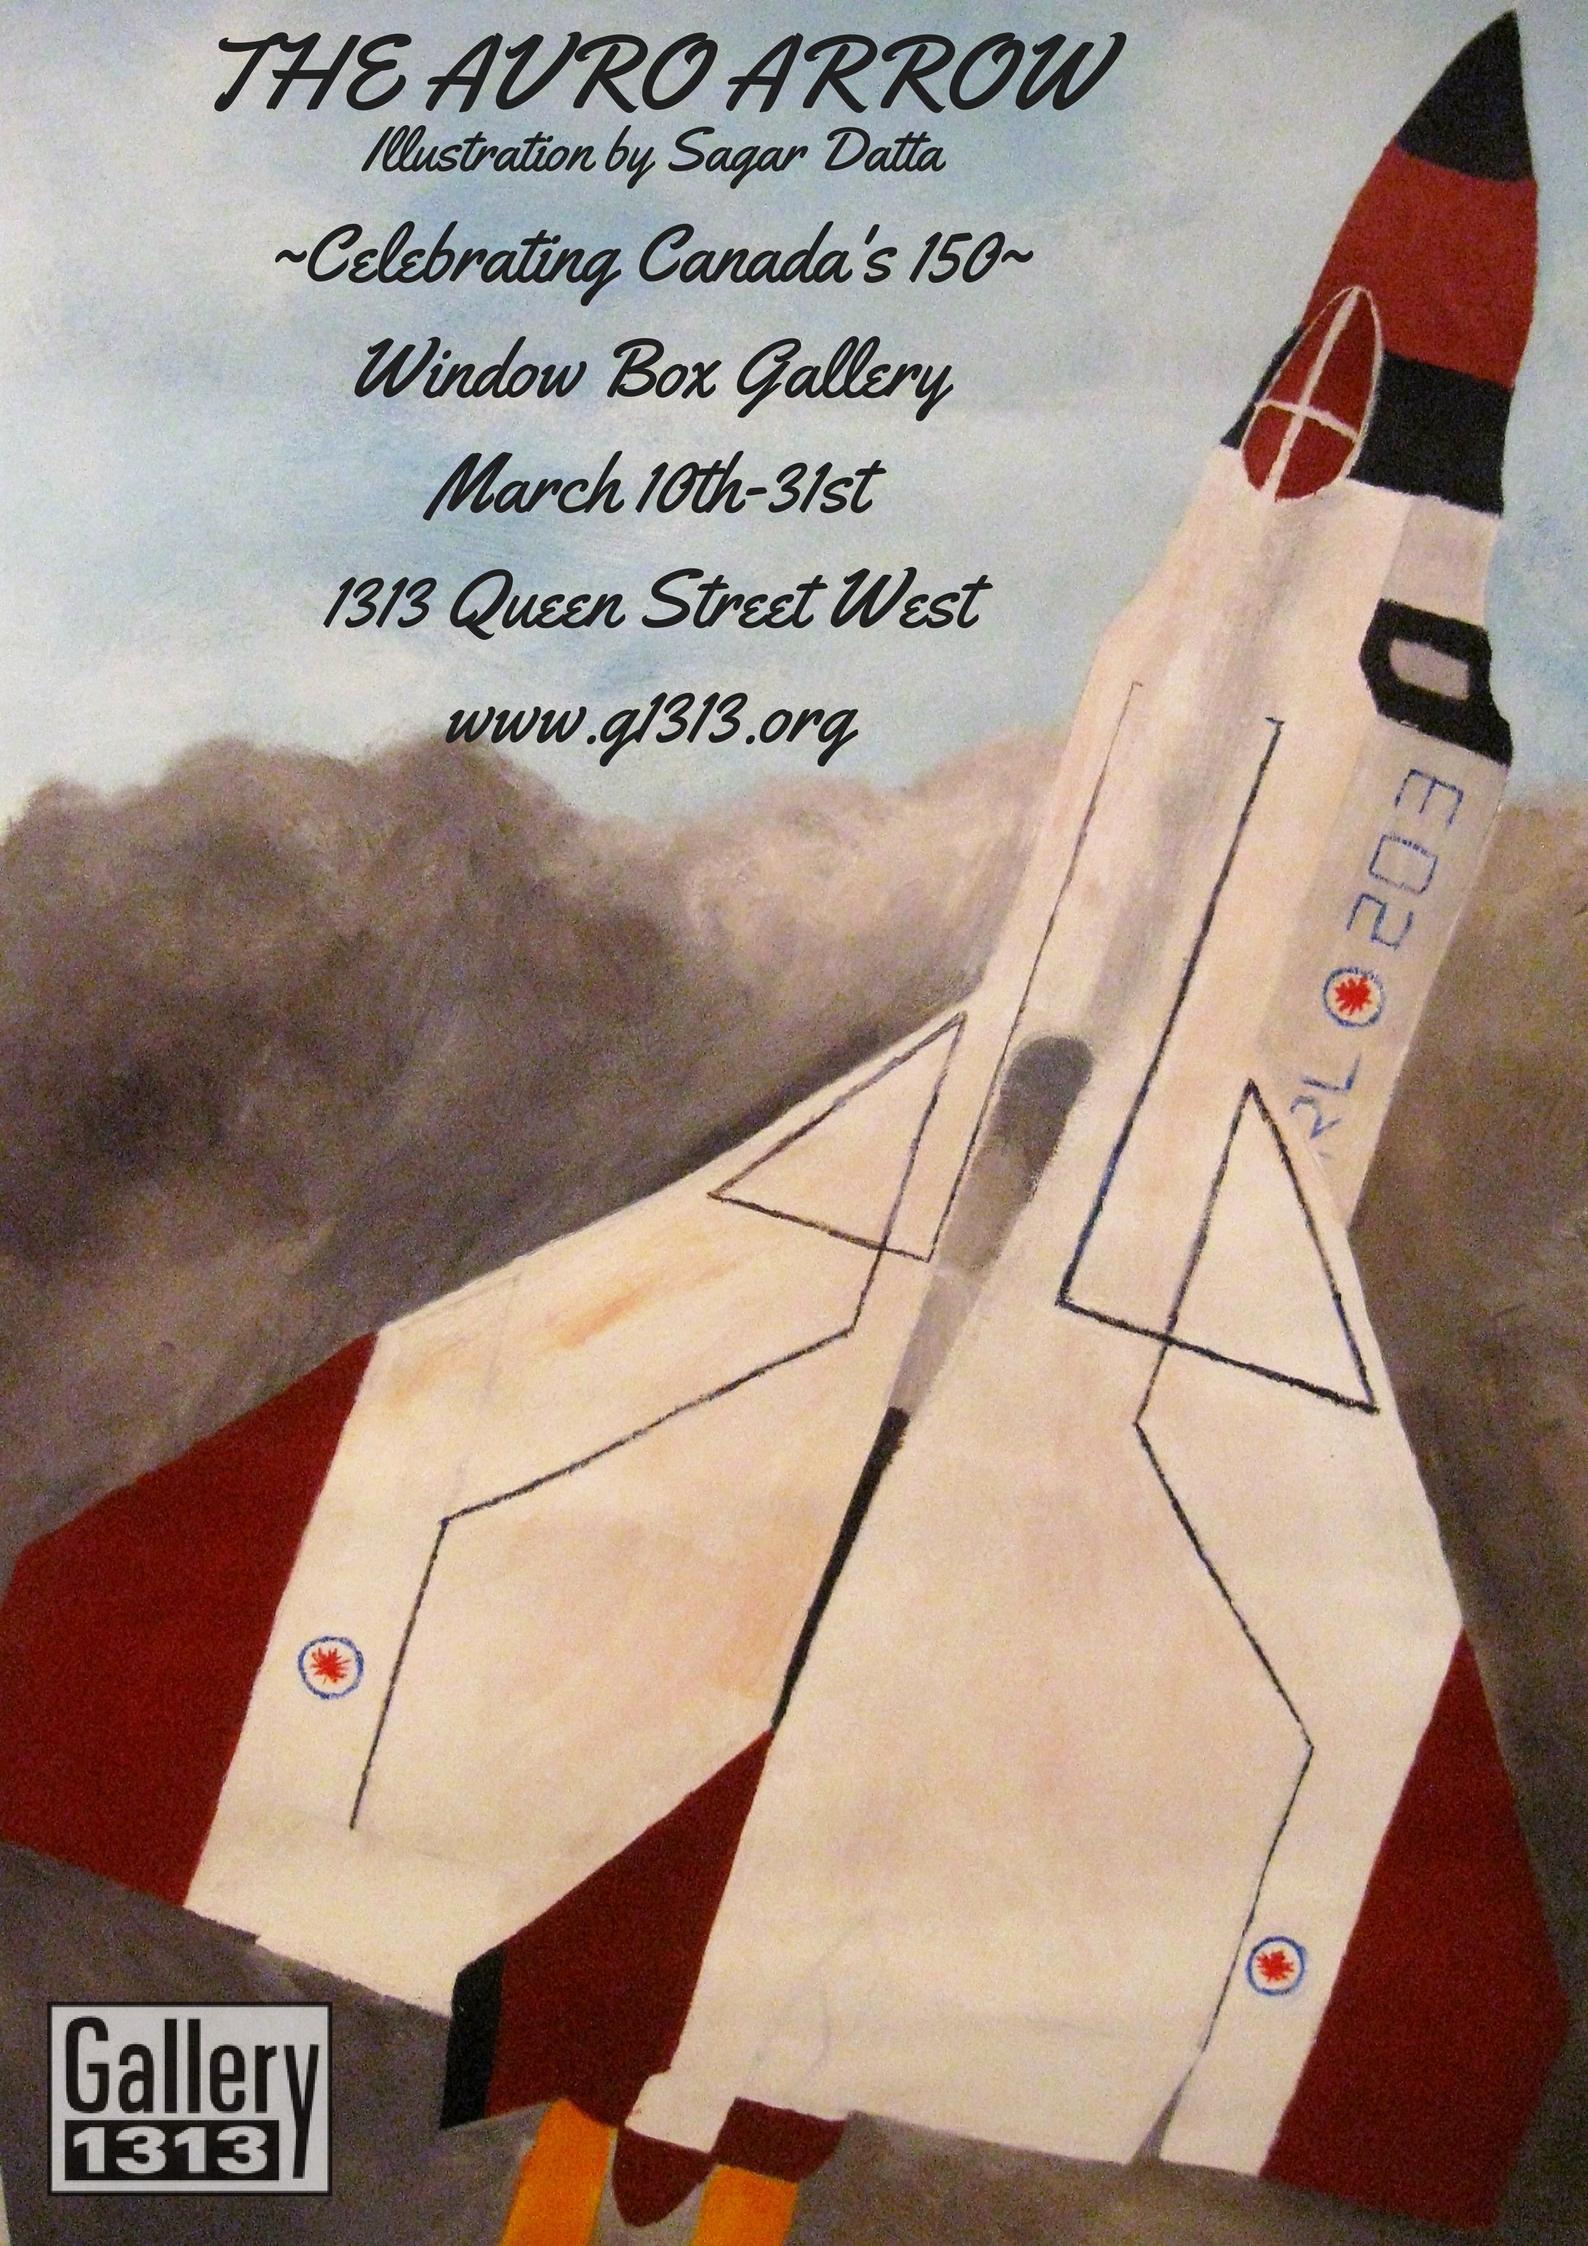 THE AVRO ARROW March 10-31